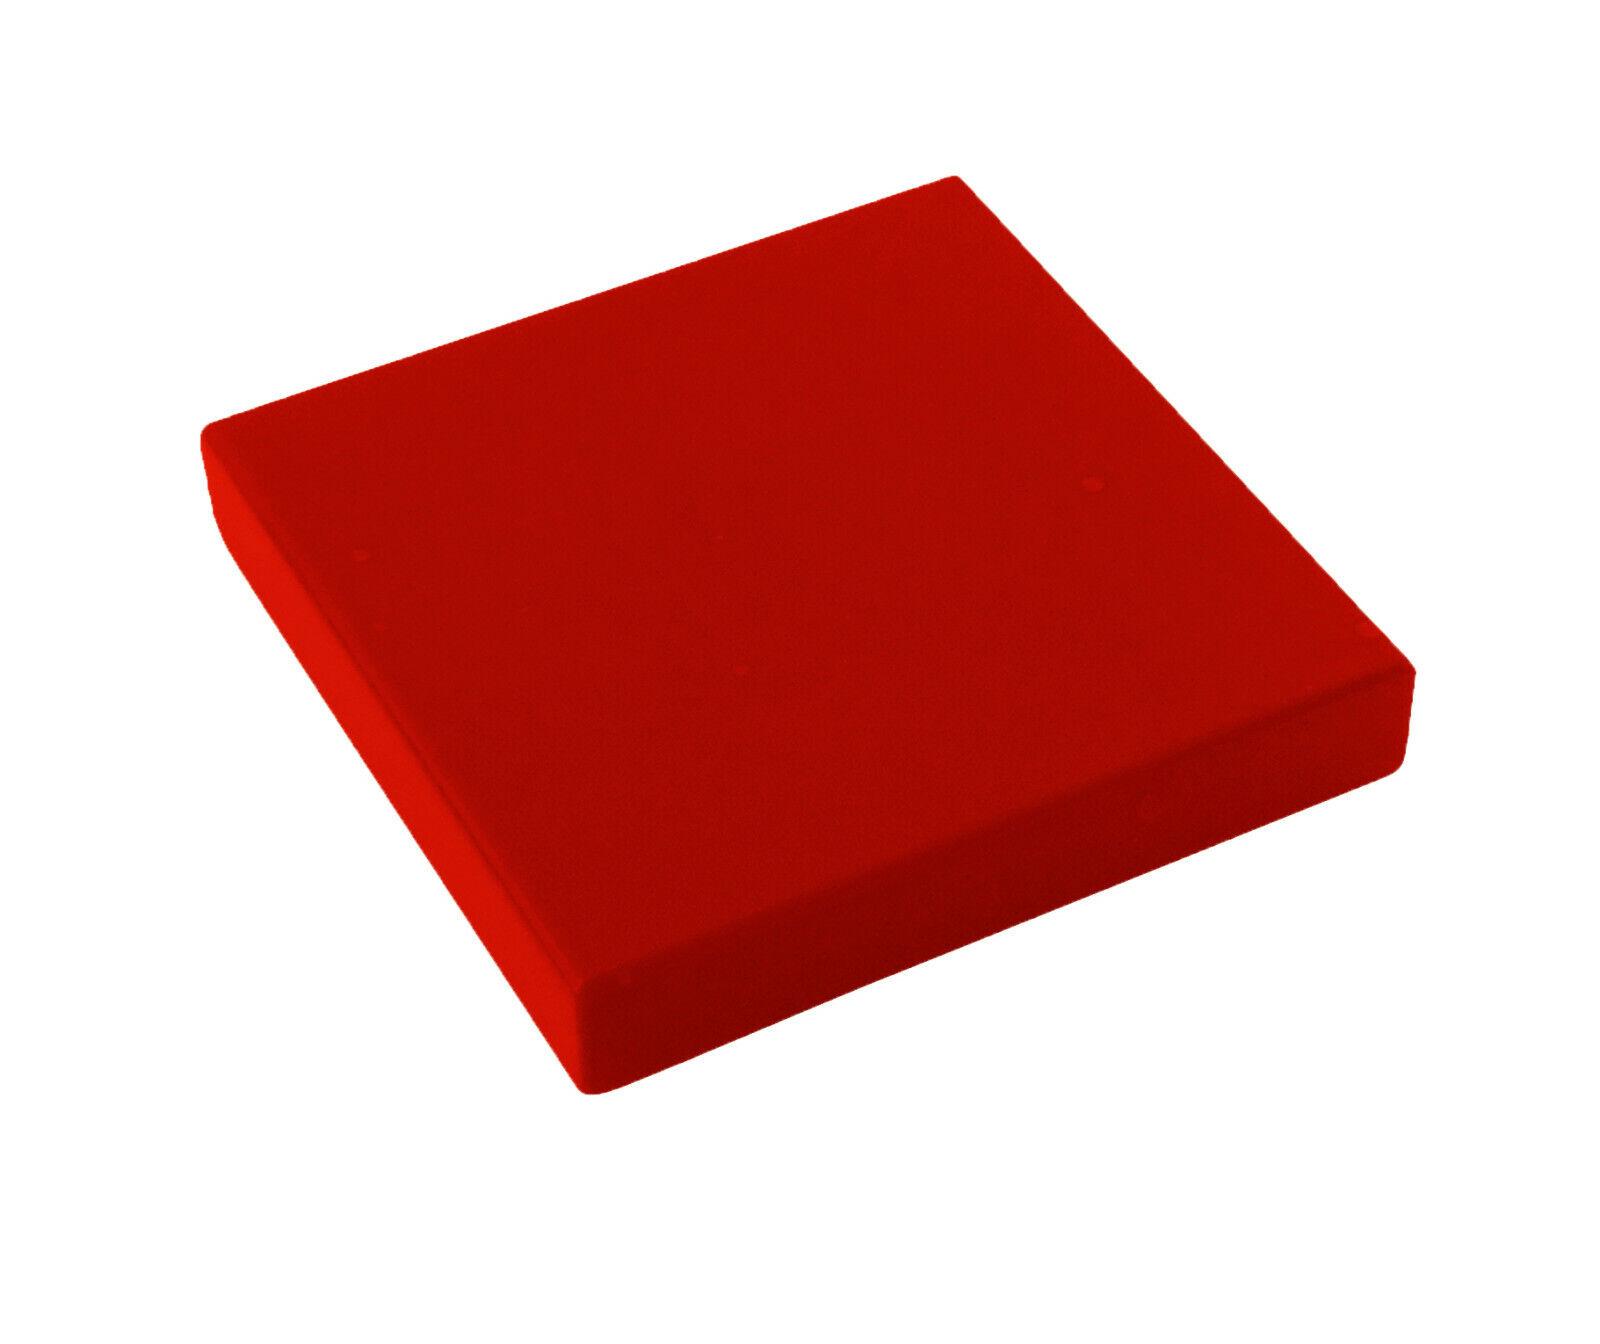 20 x Fliese Kachel 1x1 rot Red Tile 1x1 with Groove LEGO 3070b NEUWARE